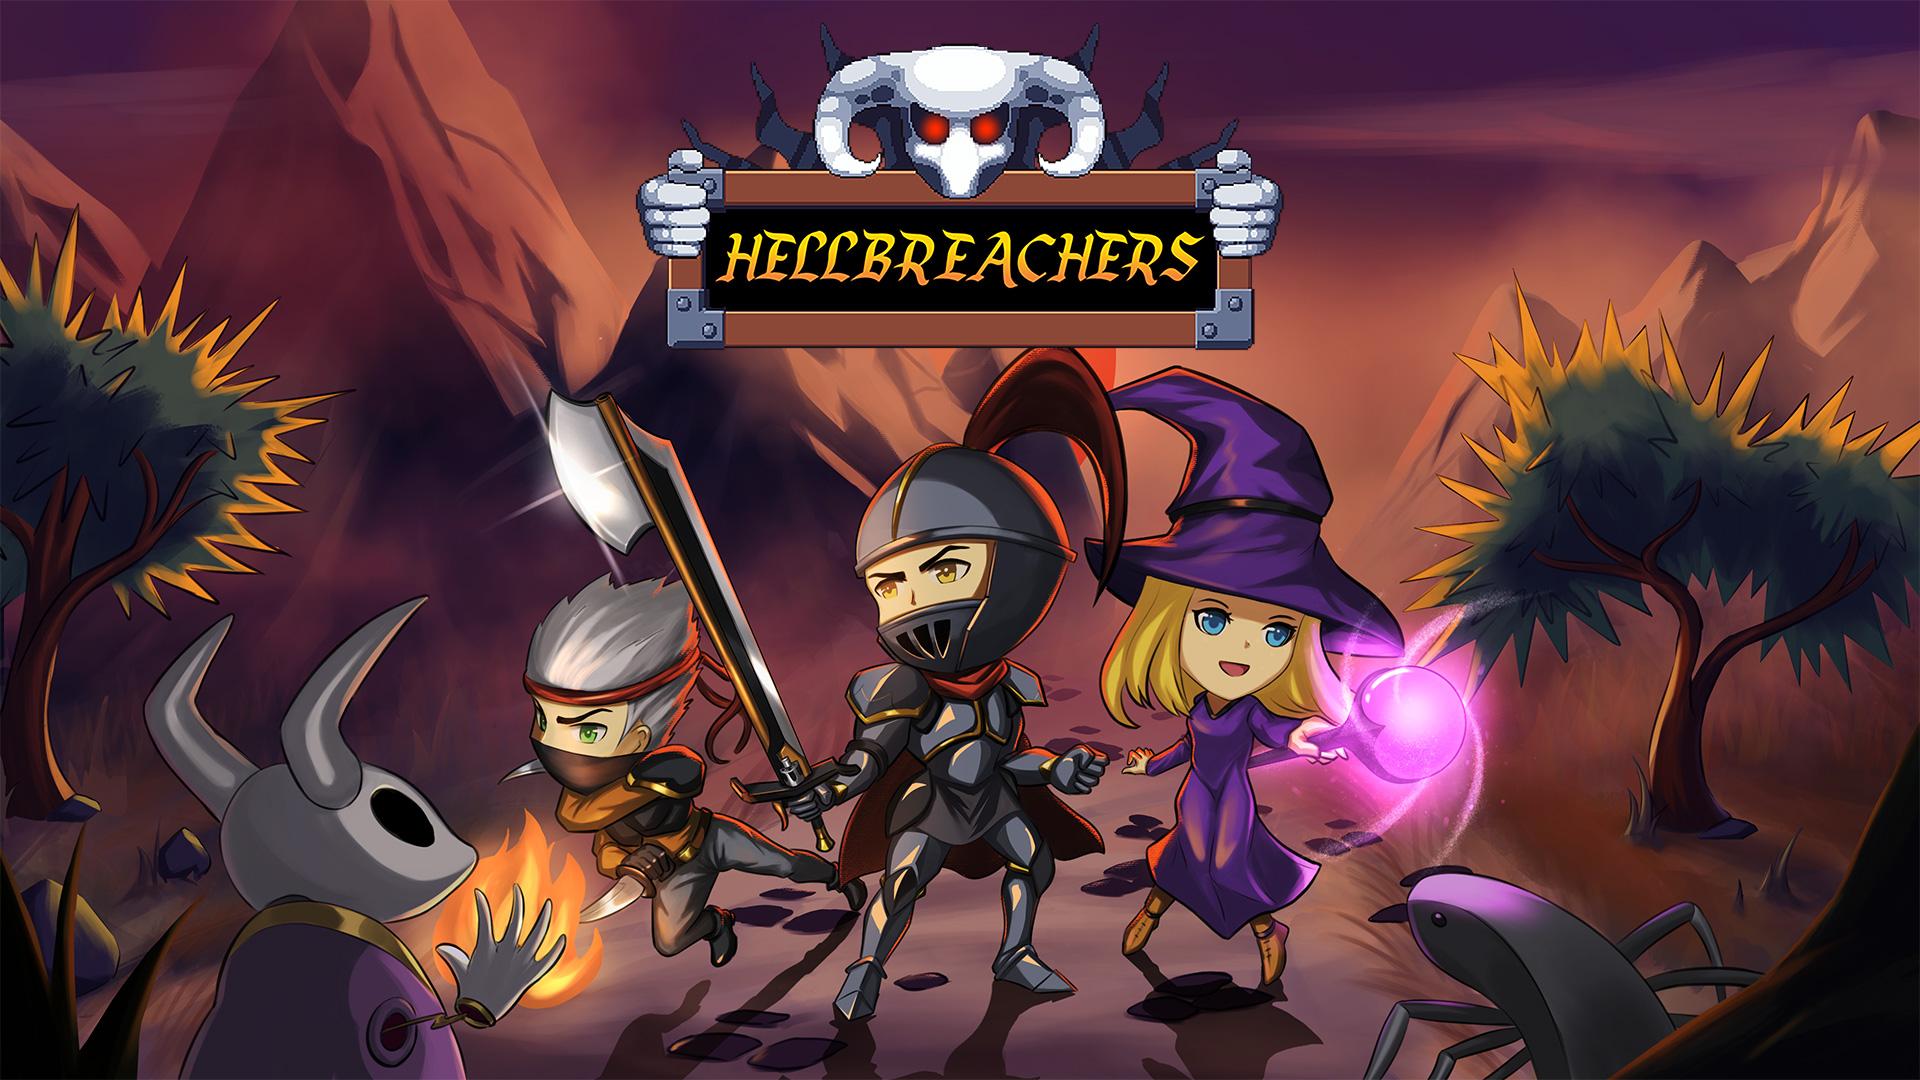 Hellbreachers - key art